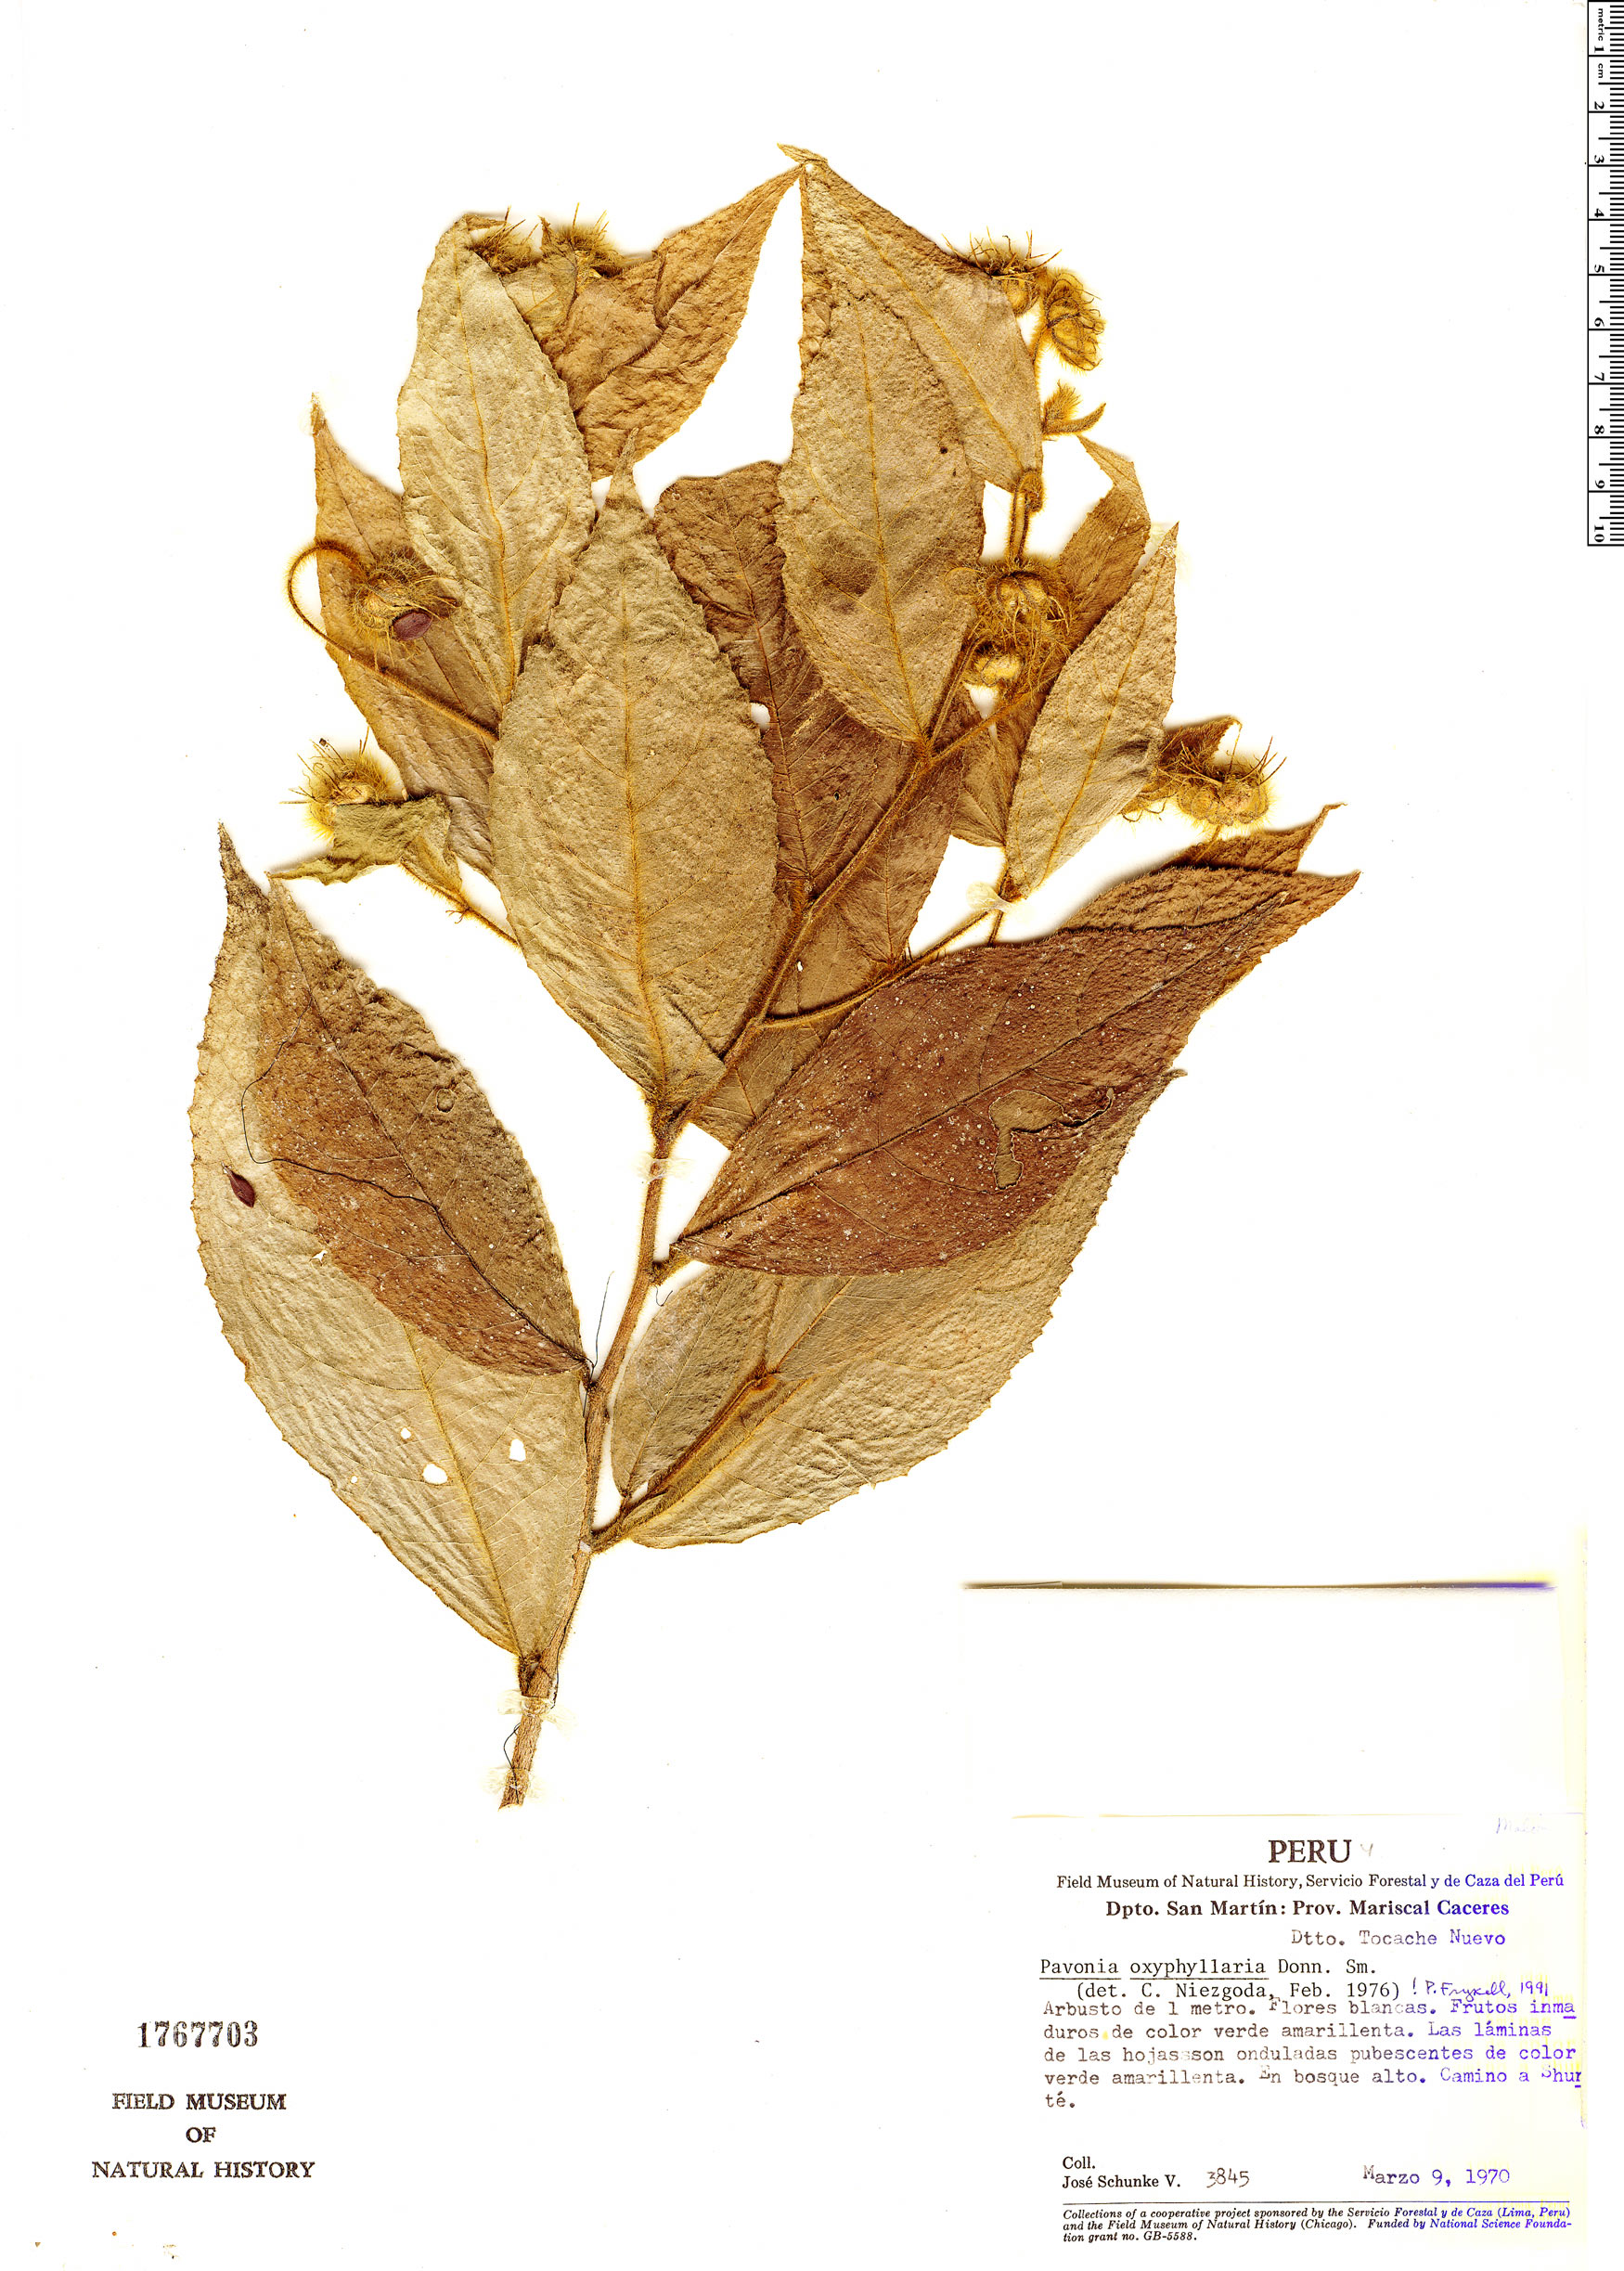 Specimen: Pavonia oxyphyllaria